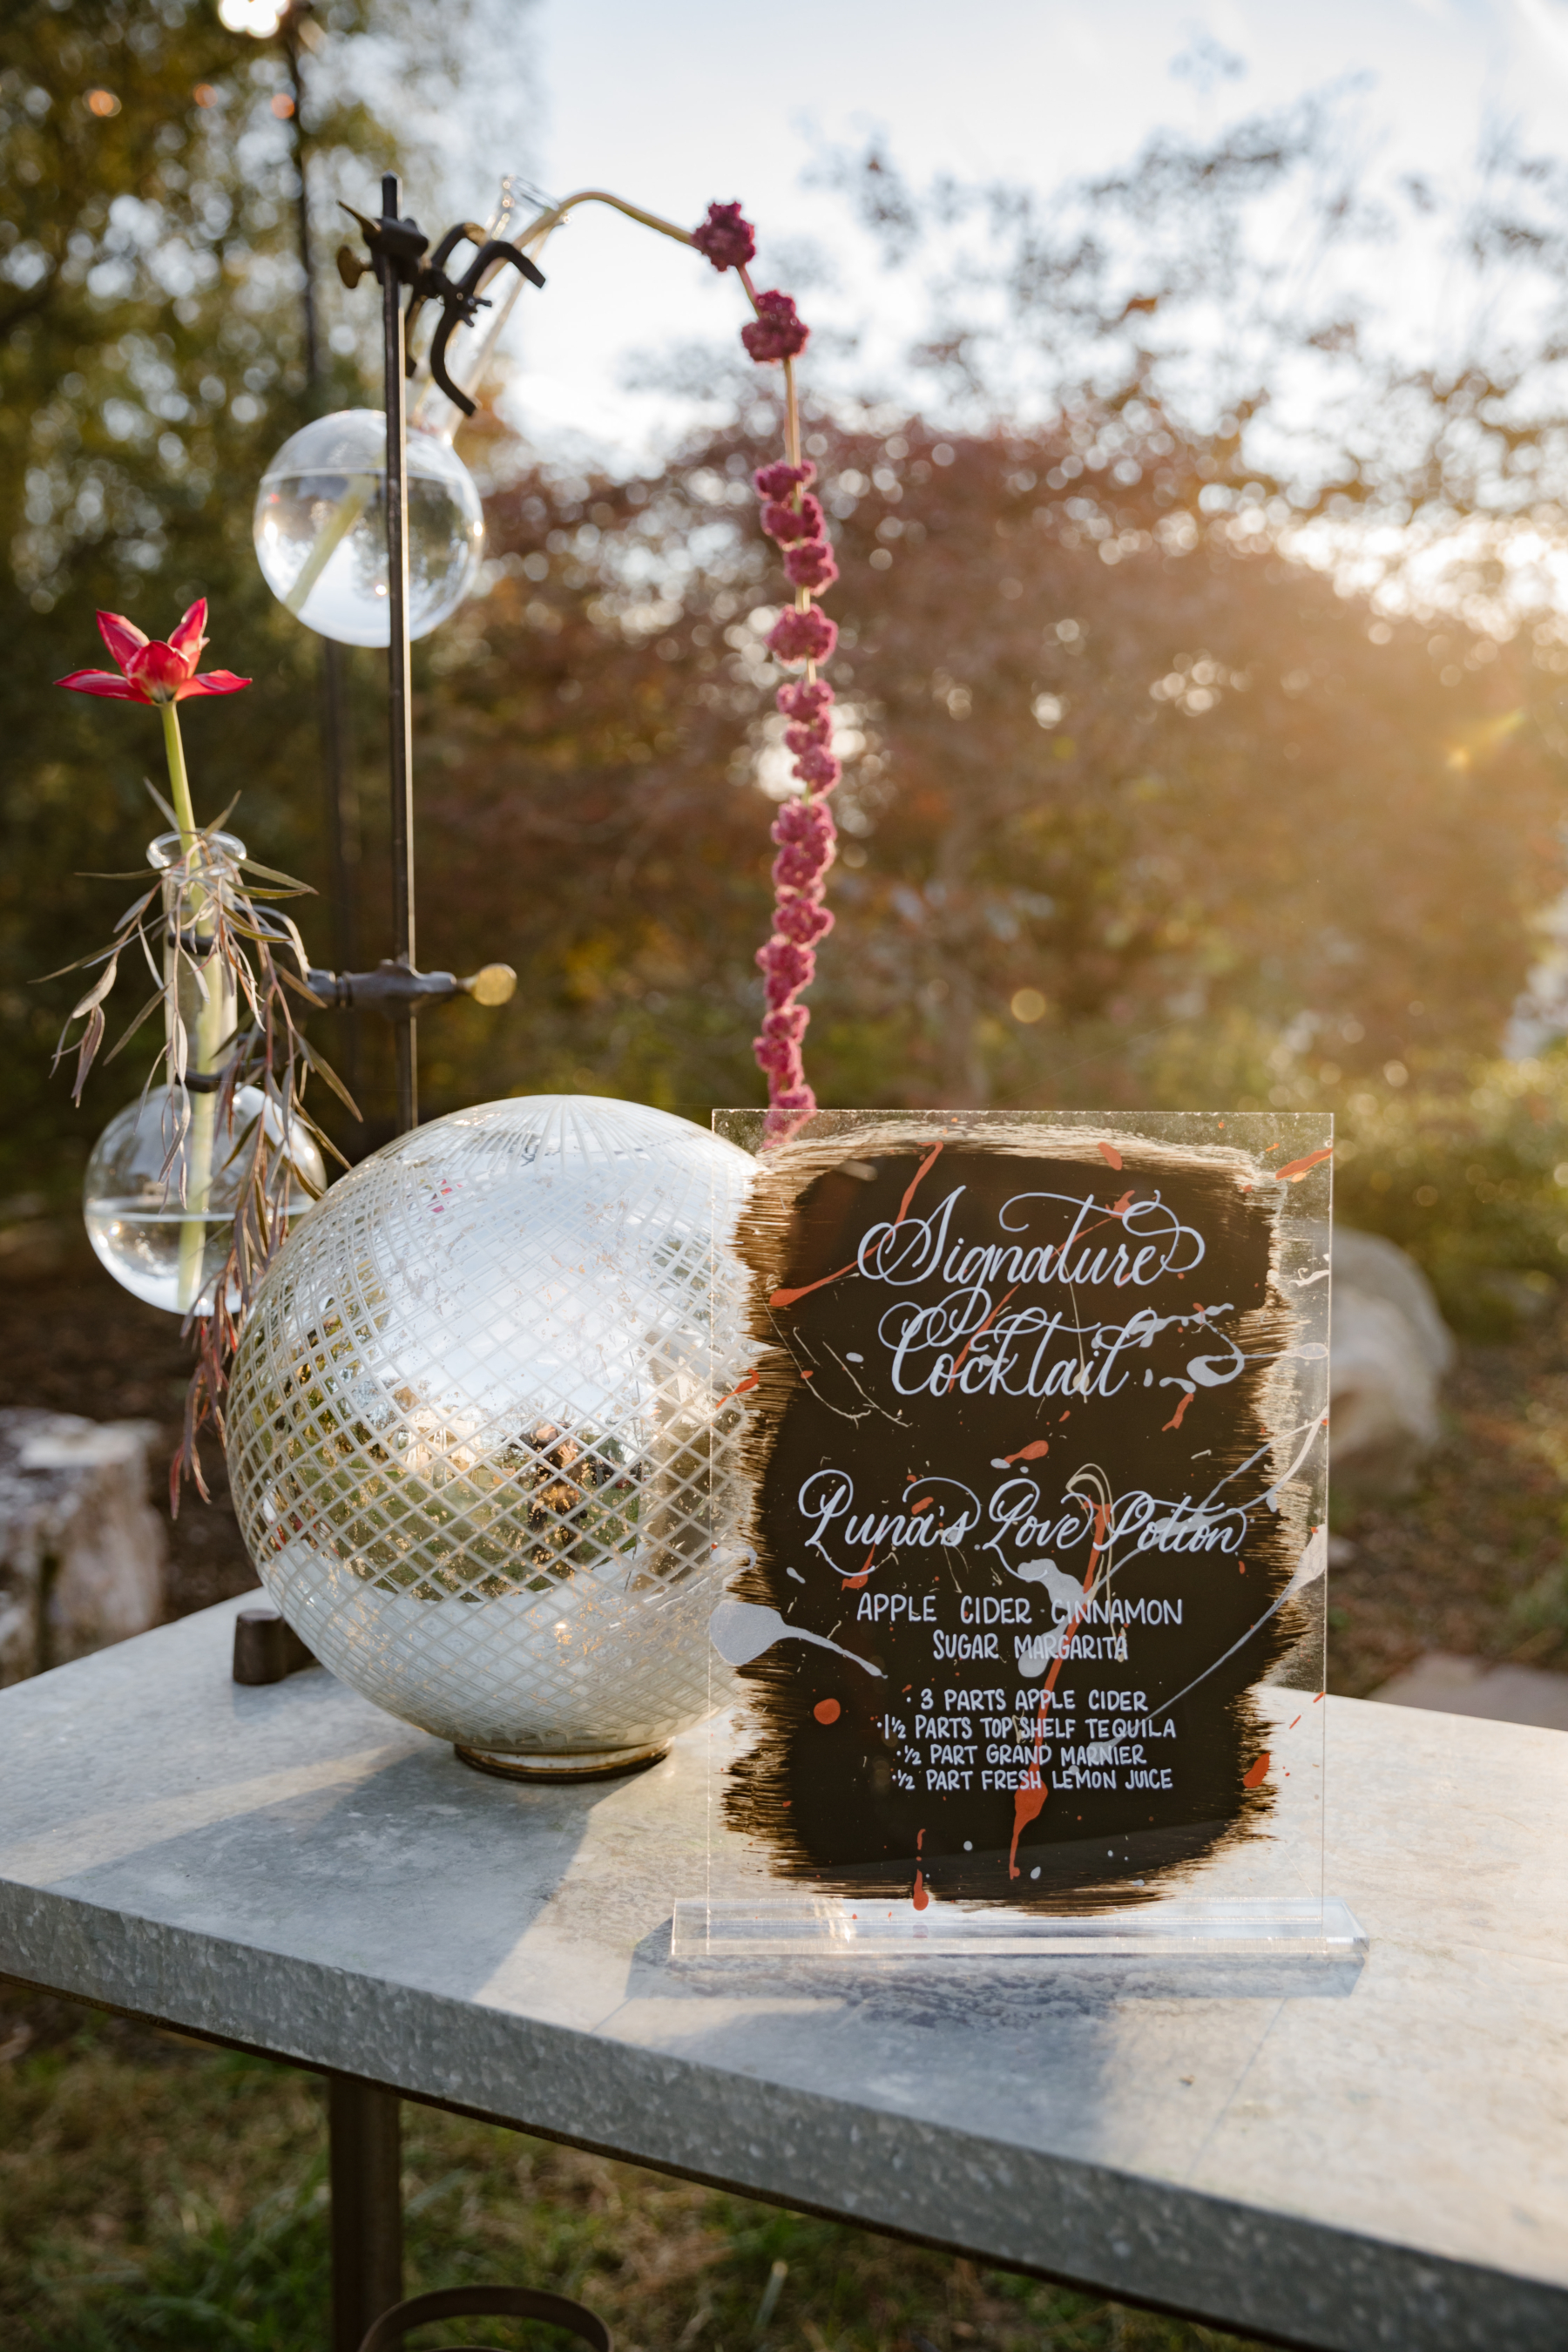 Acrylic signature cocktail wedding sign